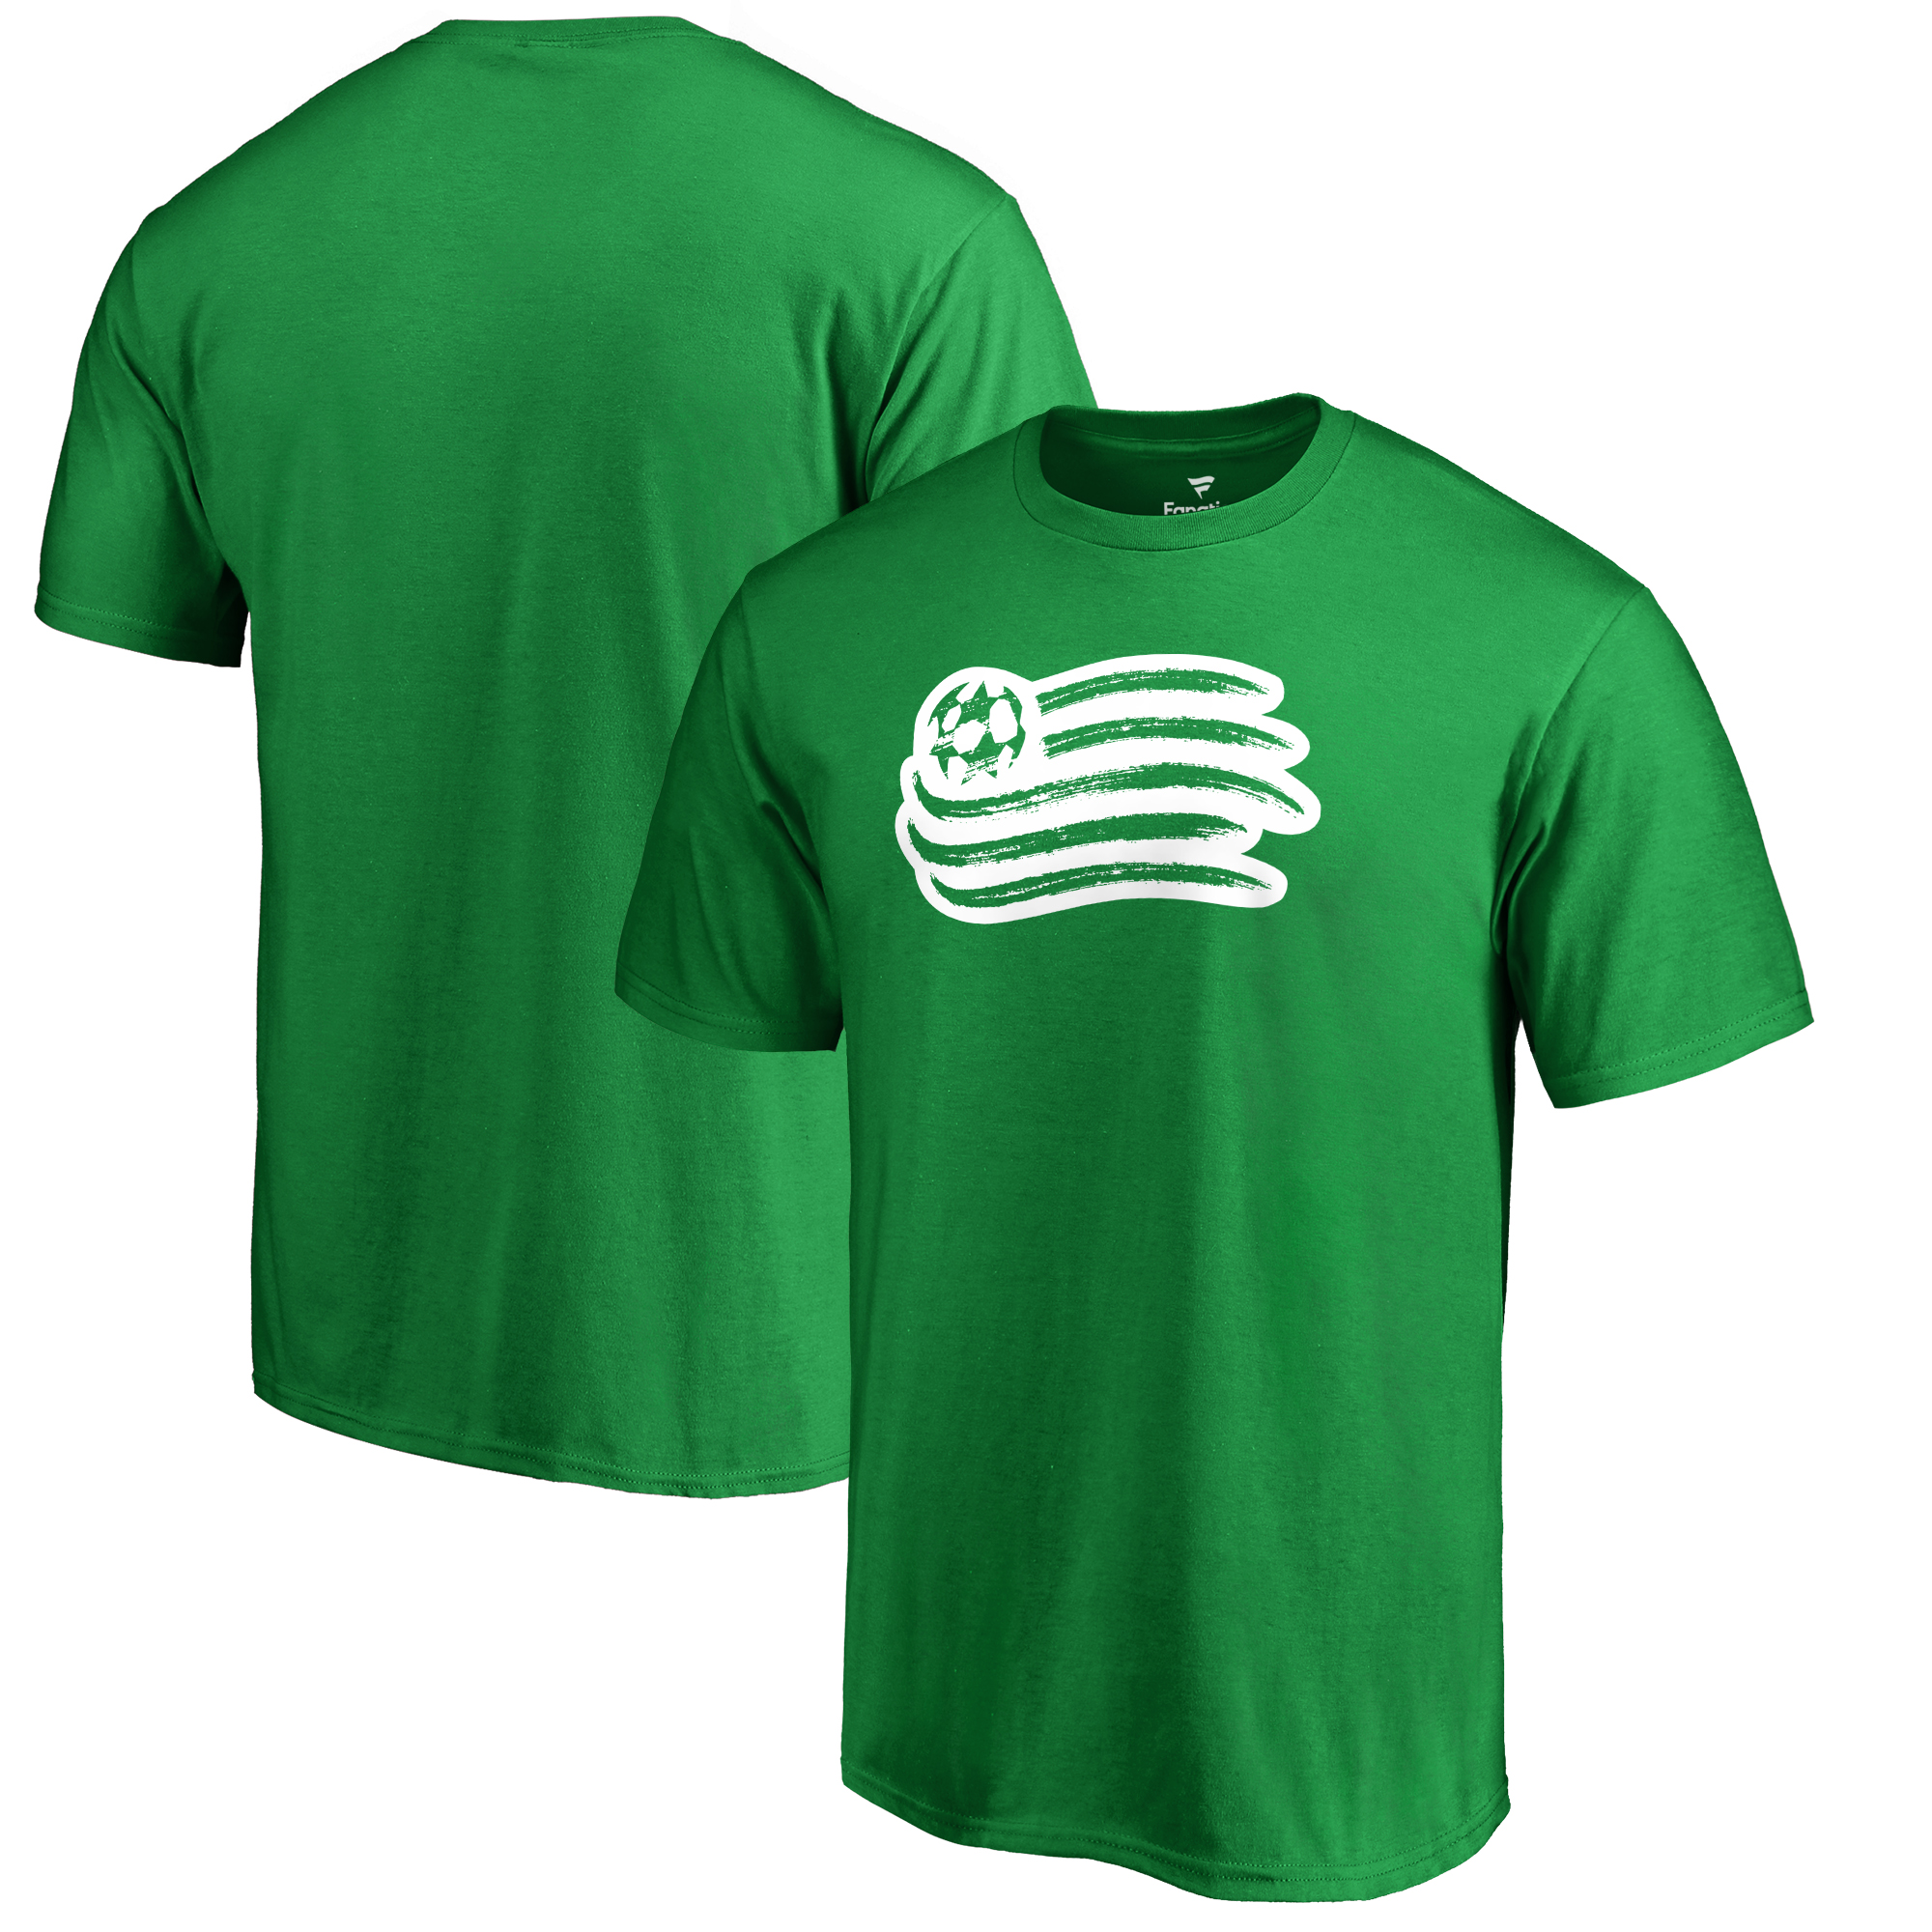 New England Revolution Fanatics Branded St. Patrick's Day White Logo T-Shirt - Kelly Green